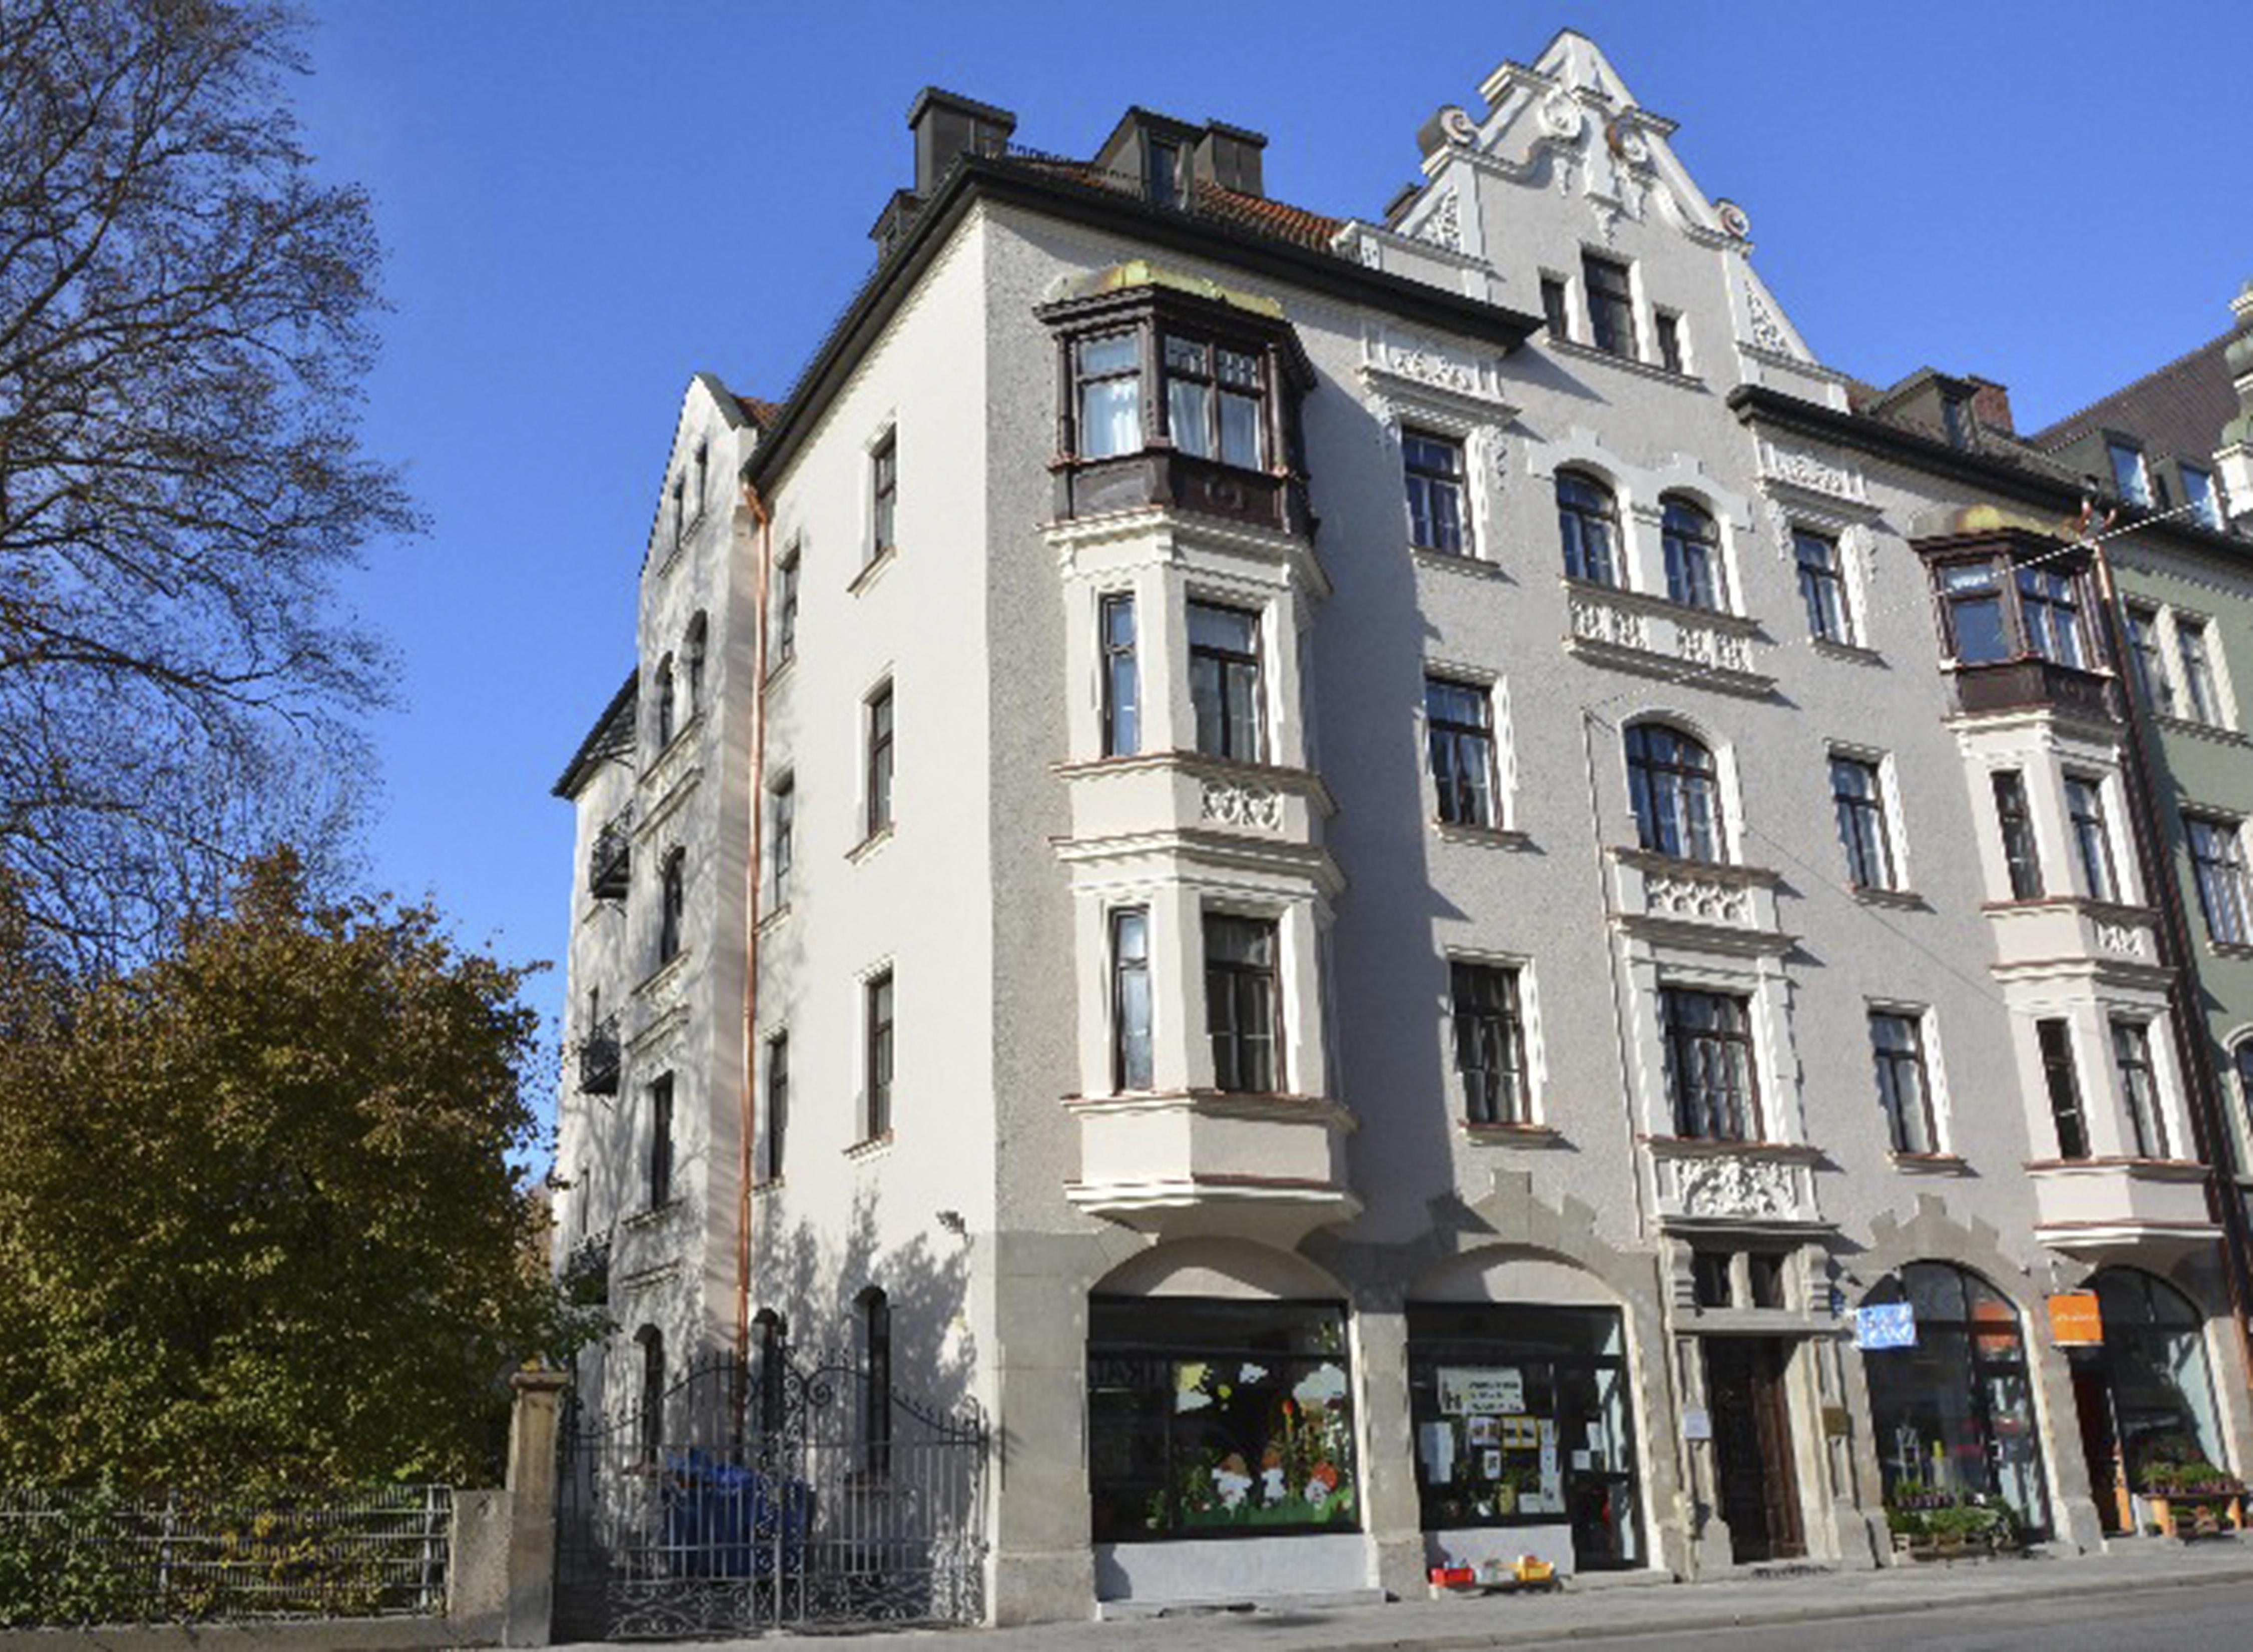 Plinganserstraße 26, 81369 München